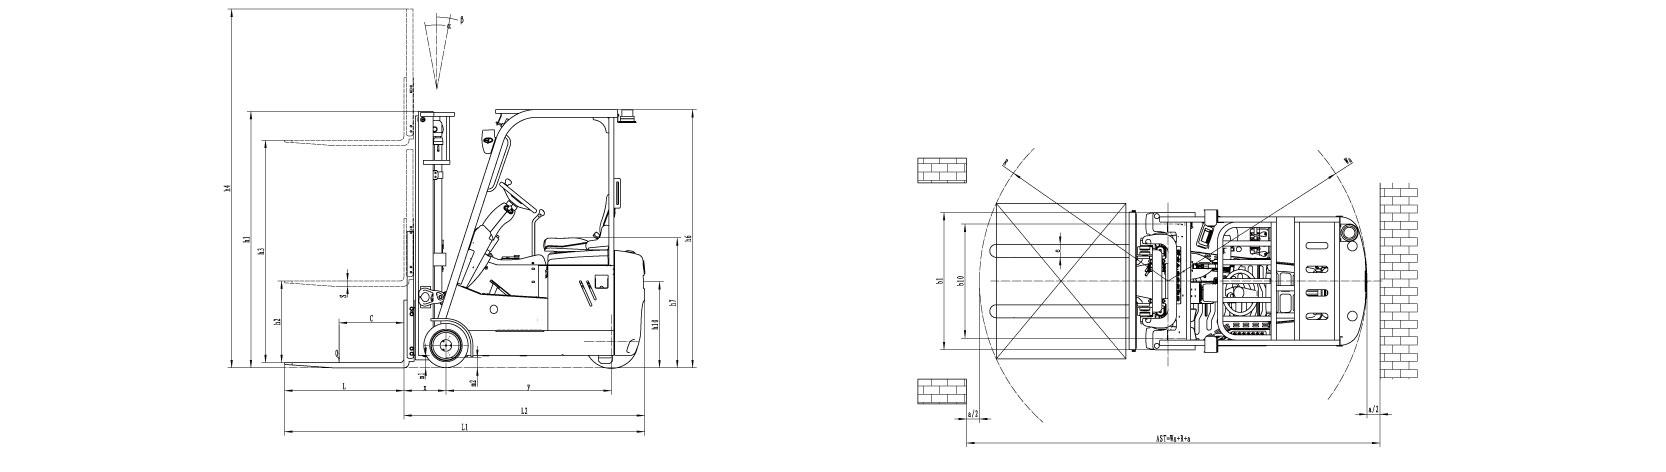 draw.jpg (64 KB)